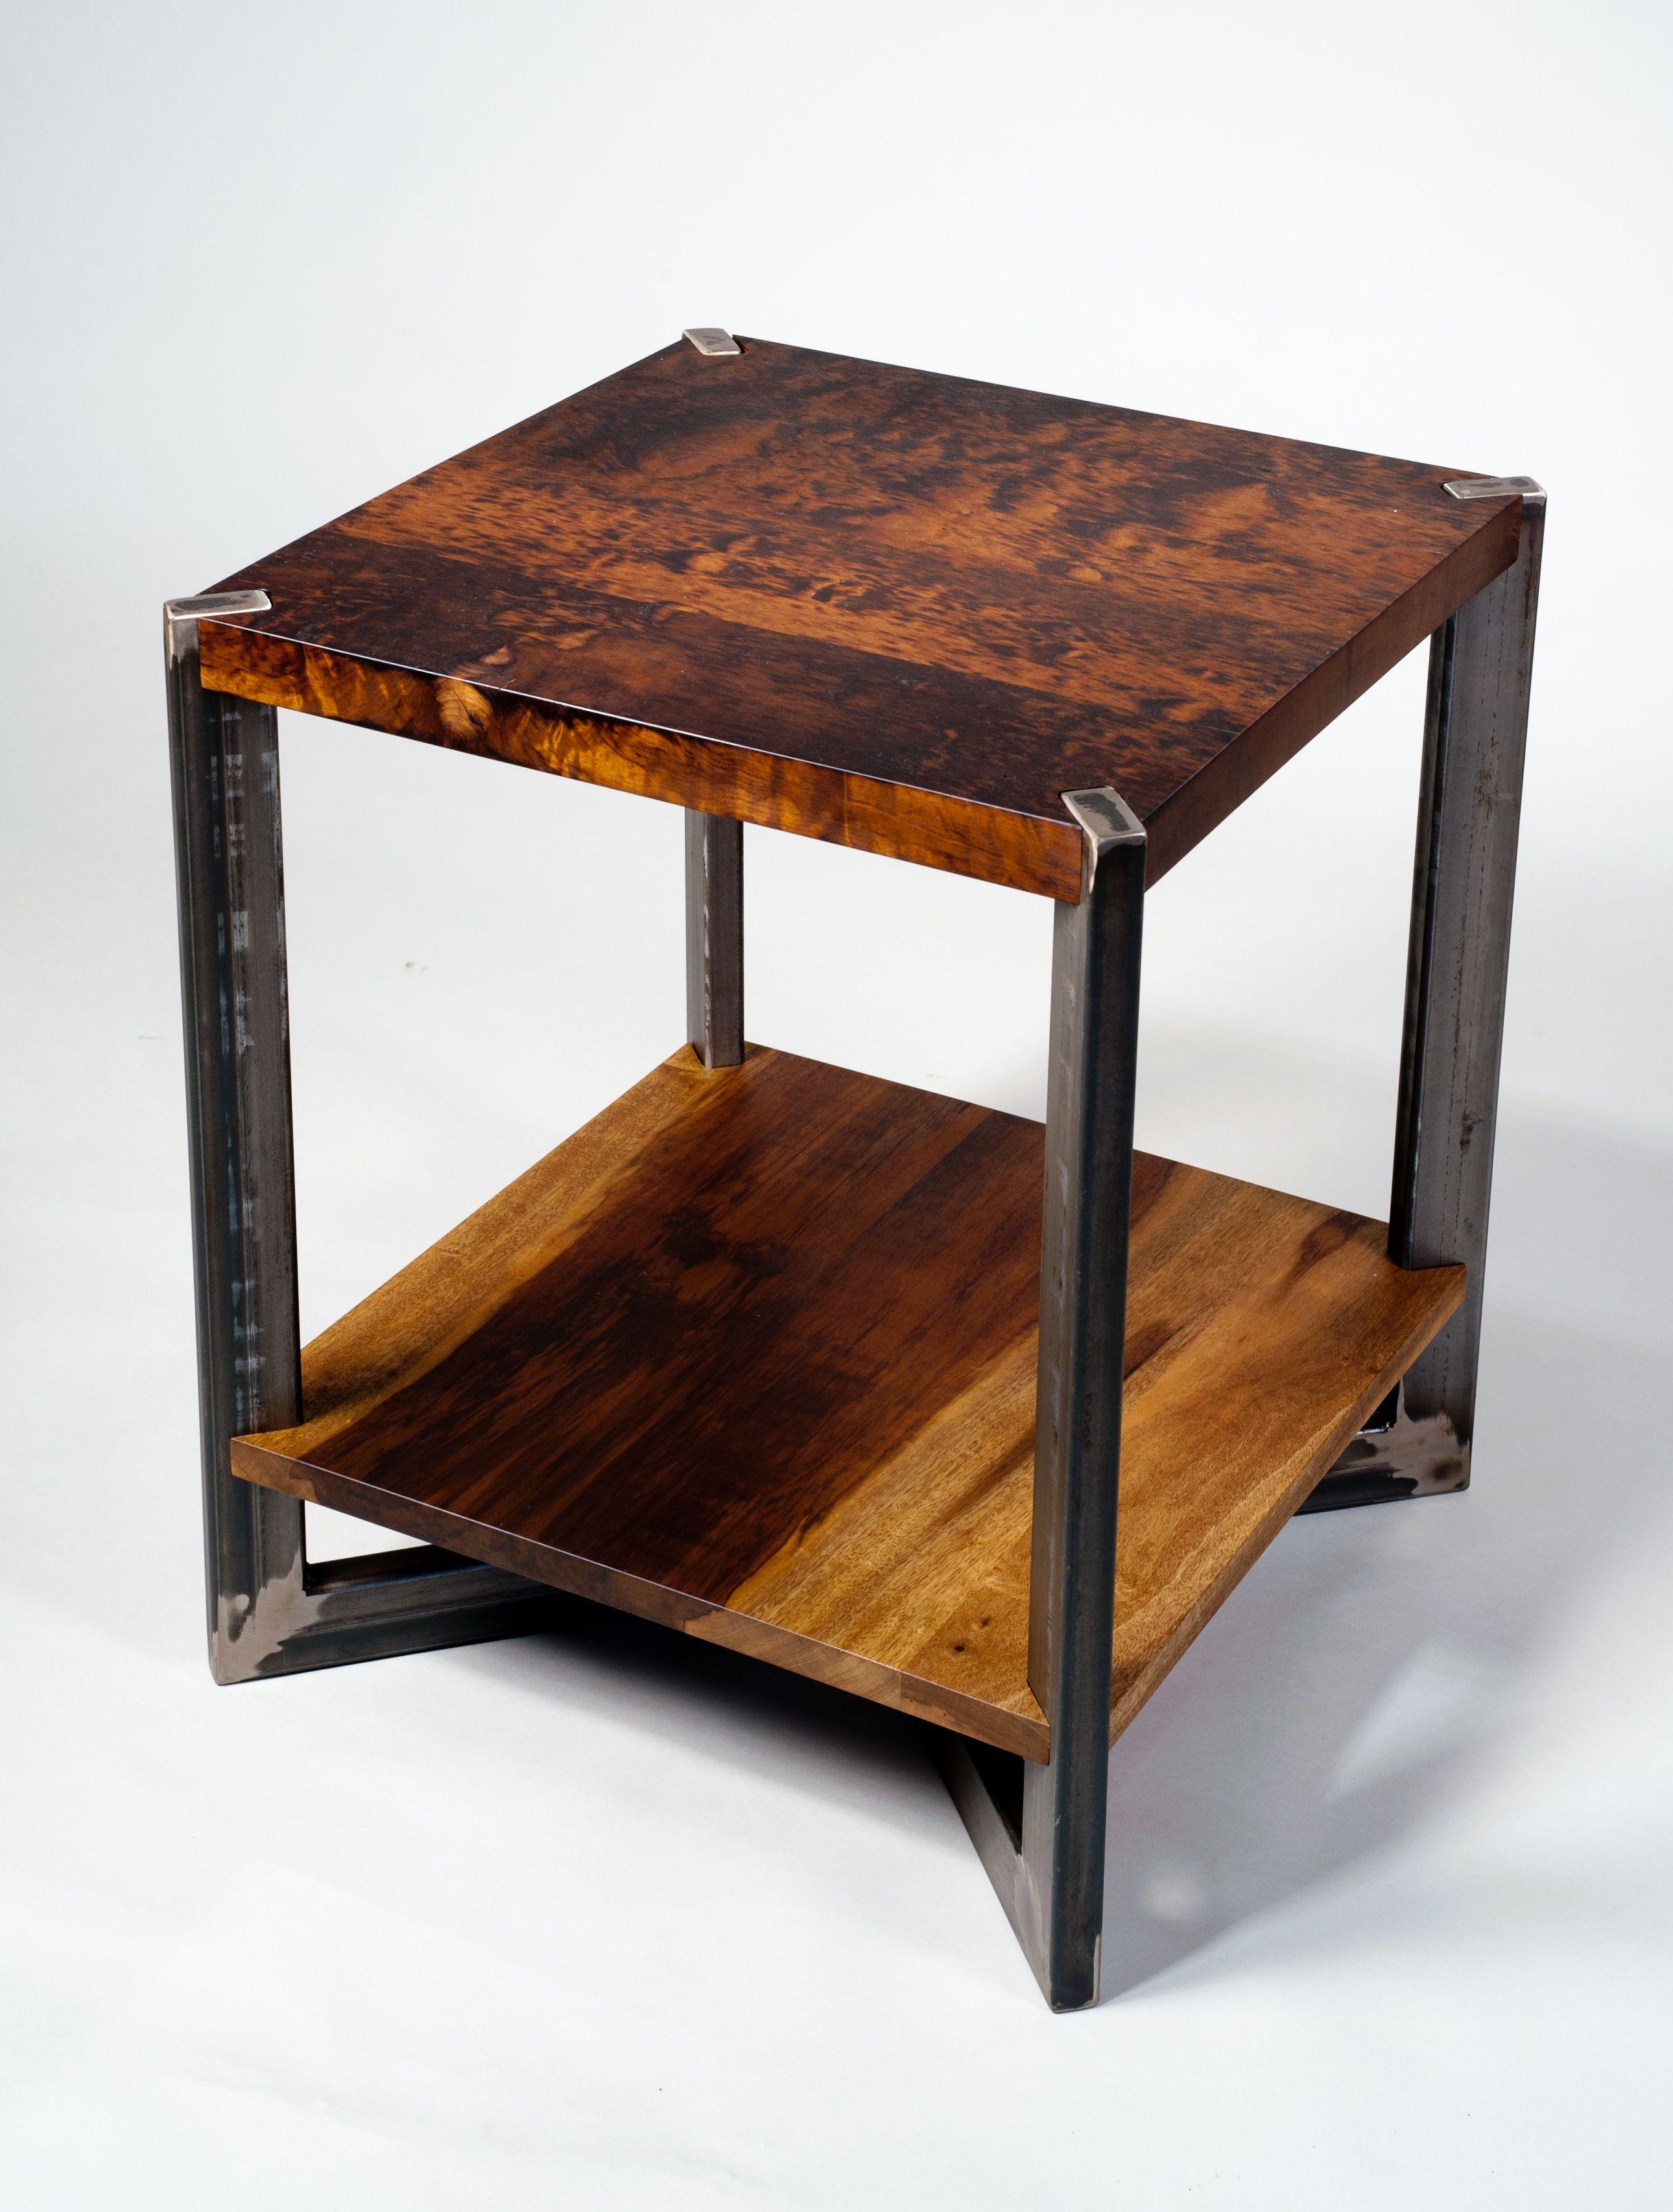 New Welding Chair Rtty1 Com Rtty1 Com